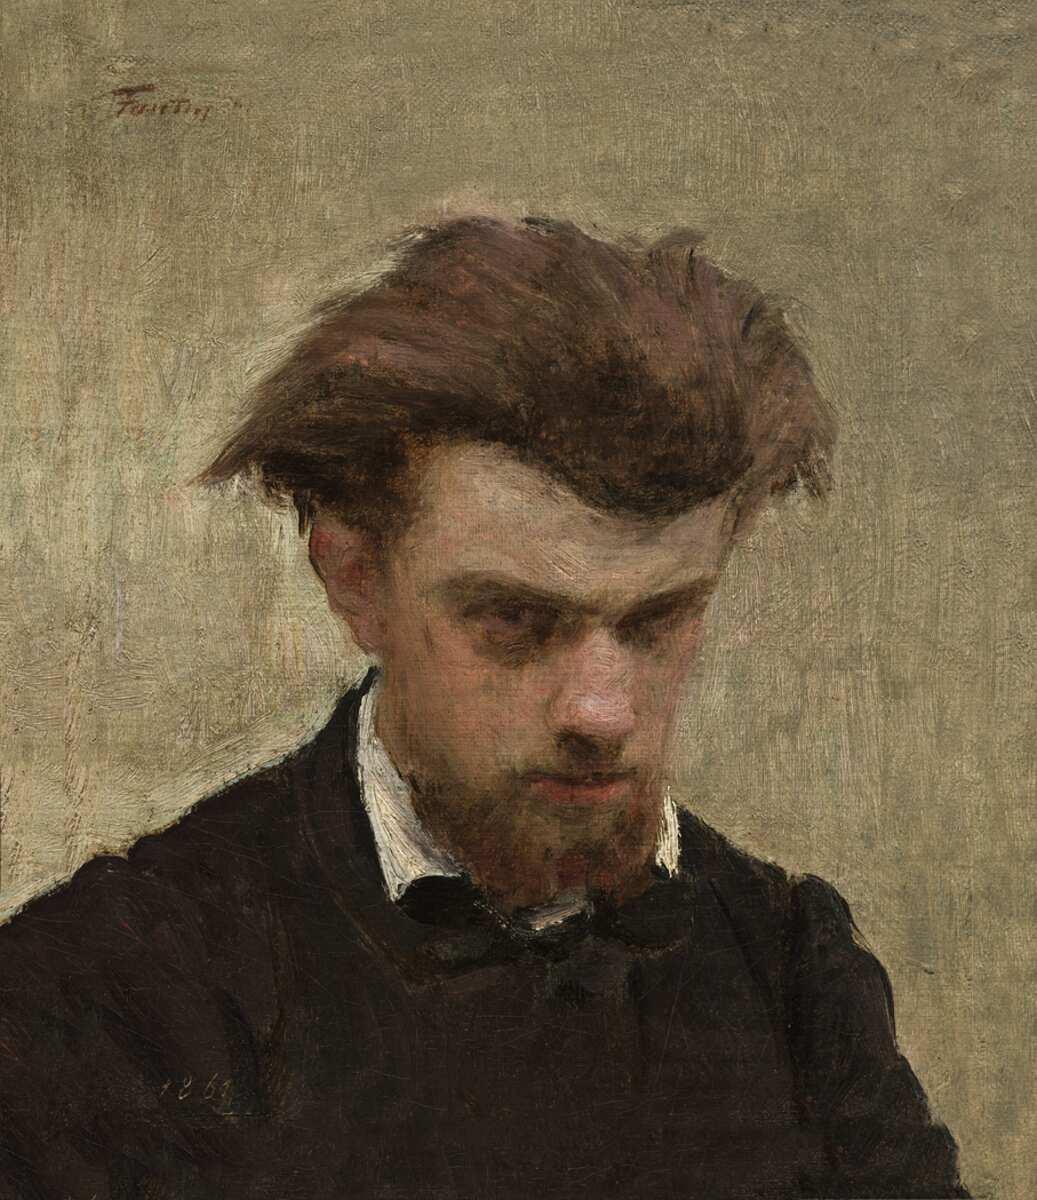 Henri Fantin-Latour, Selbstporträt mit leicht gesenktem Kopf, 1861, Öl auf Leinwand, 25,1 x 21,4 cm (Washington, National Gallery of Art Courtesy National Gallery of Art, Washington)